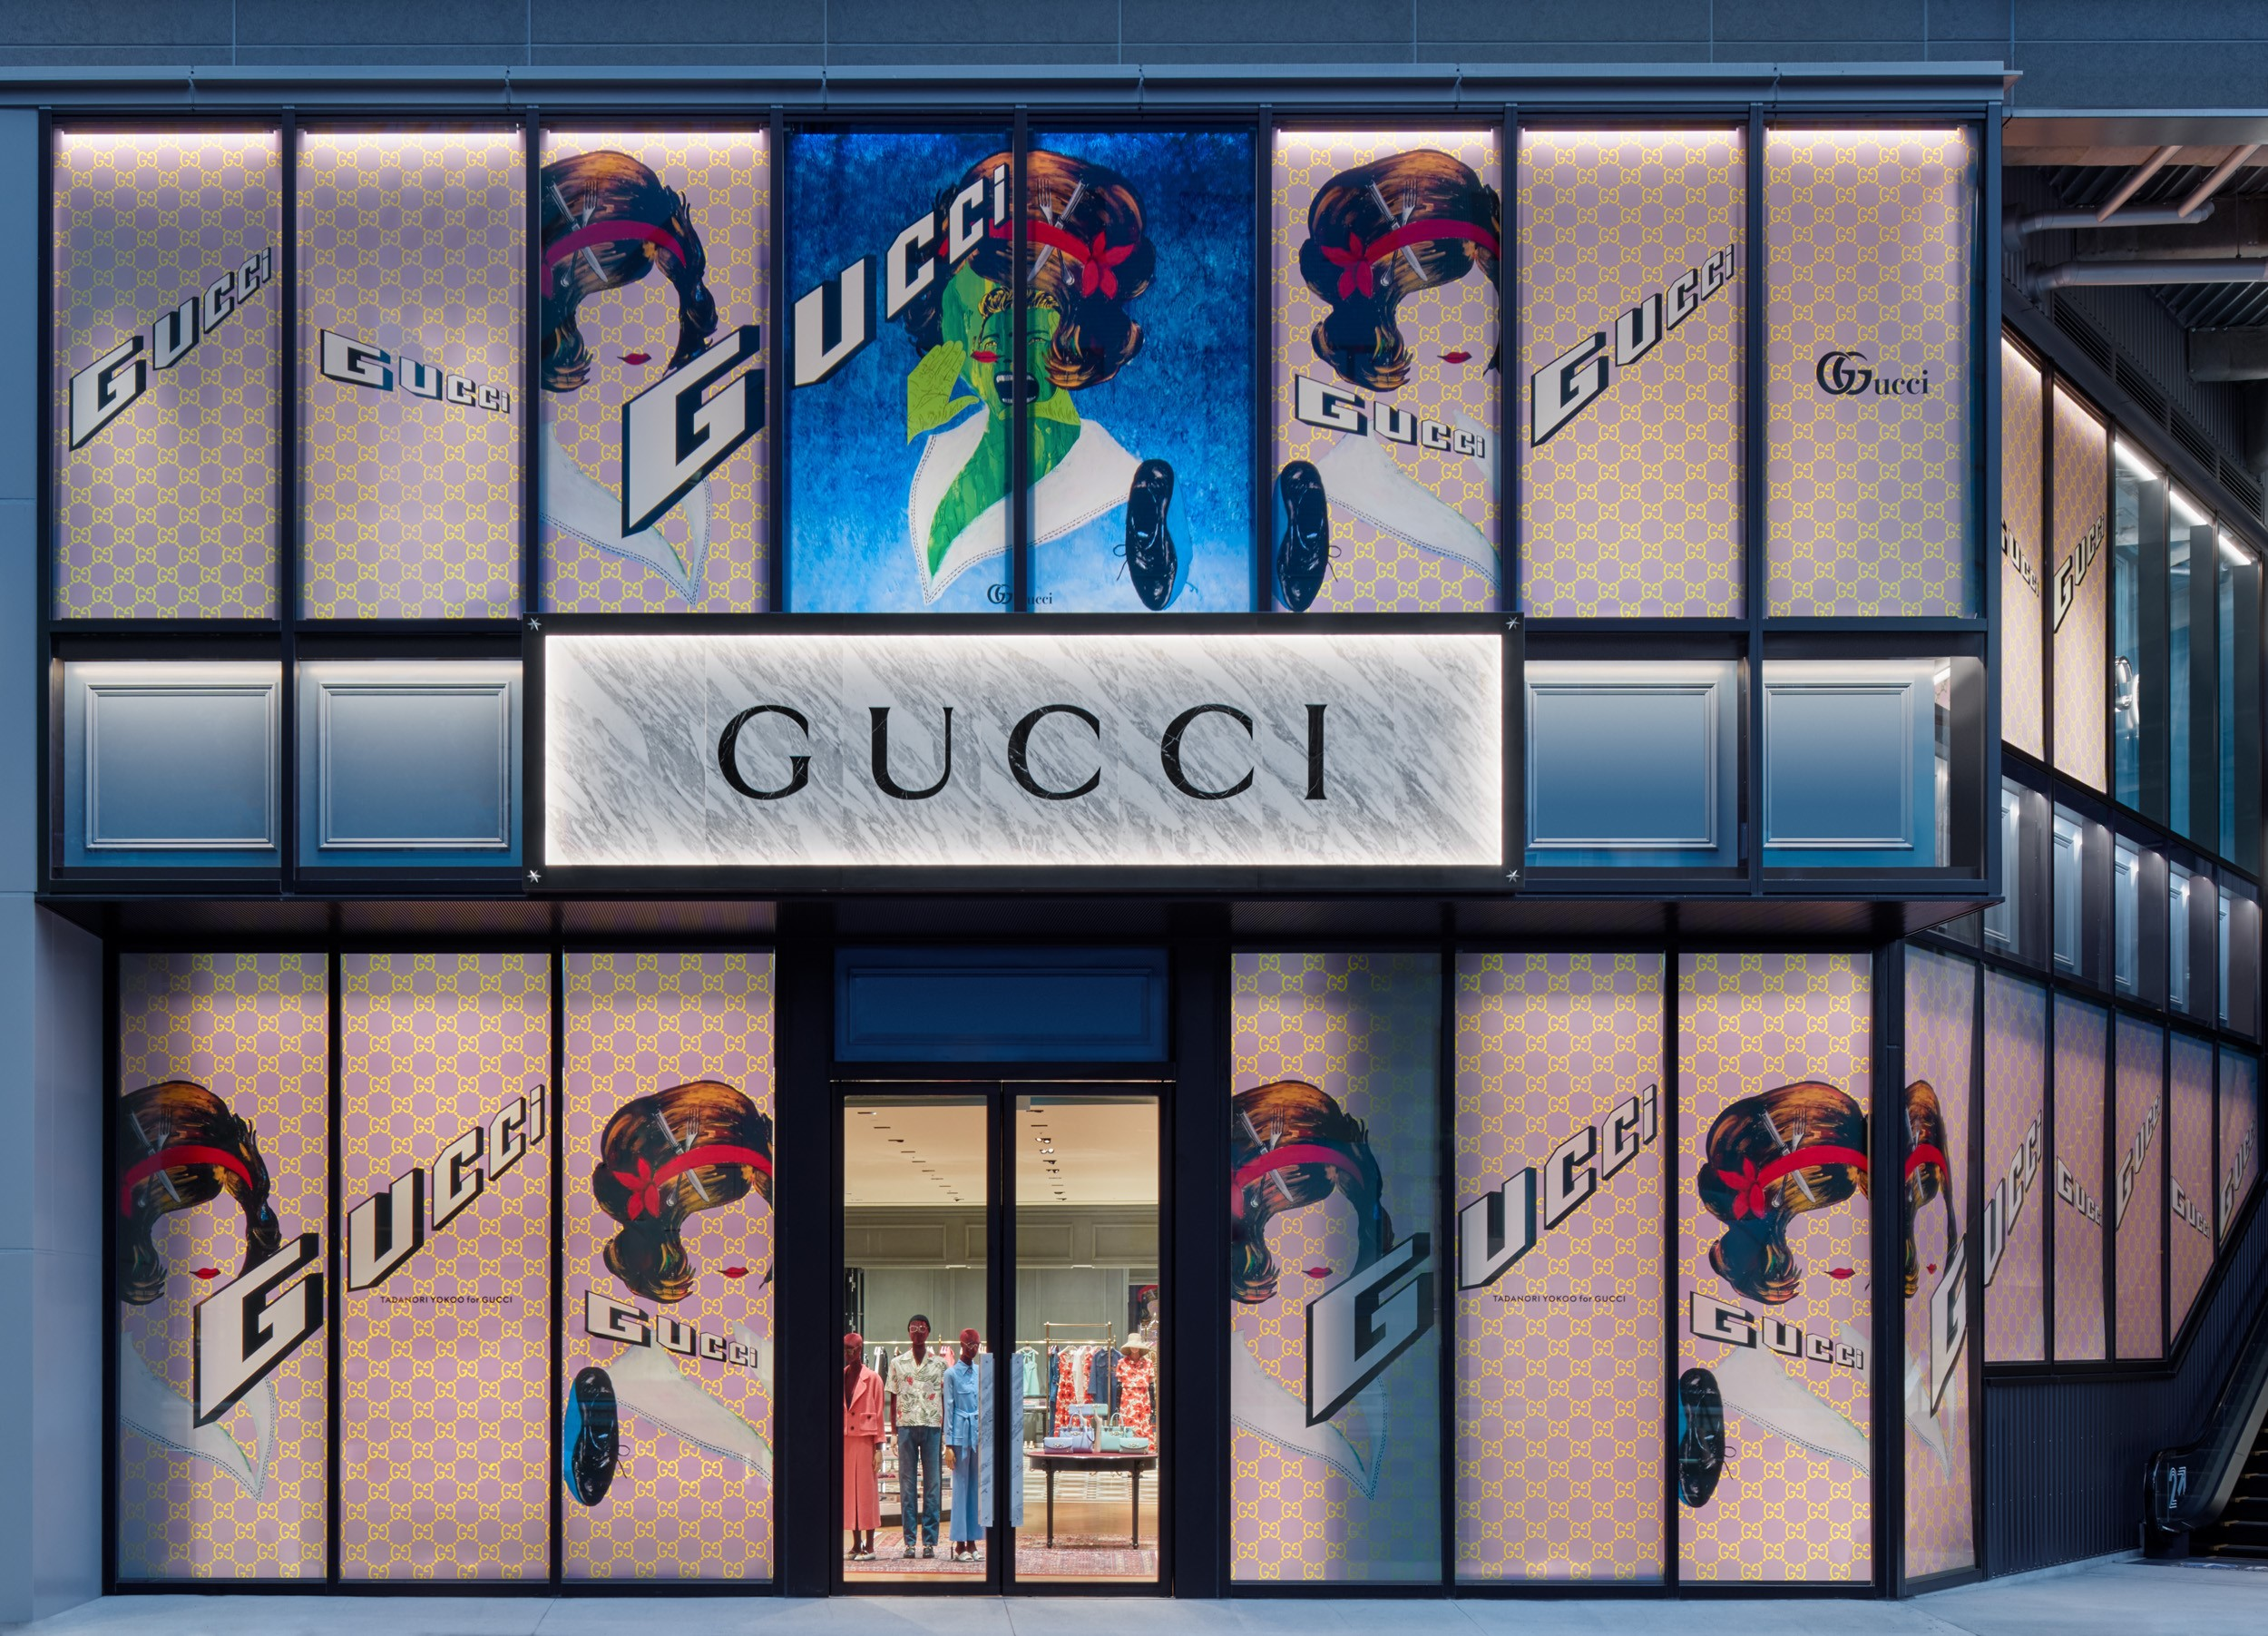 「GUCCI(グッチ)」が渋谷・ミヤシタパークに新店舗をオープン! 日本を代表する2人のアーティスト、横尾忠則と大友昇平が、グッチのために特別なアートワークを制作